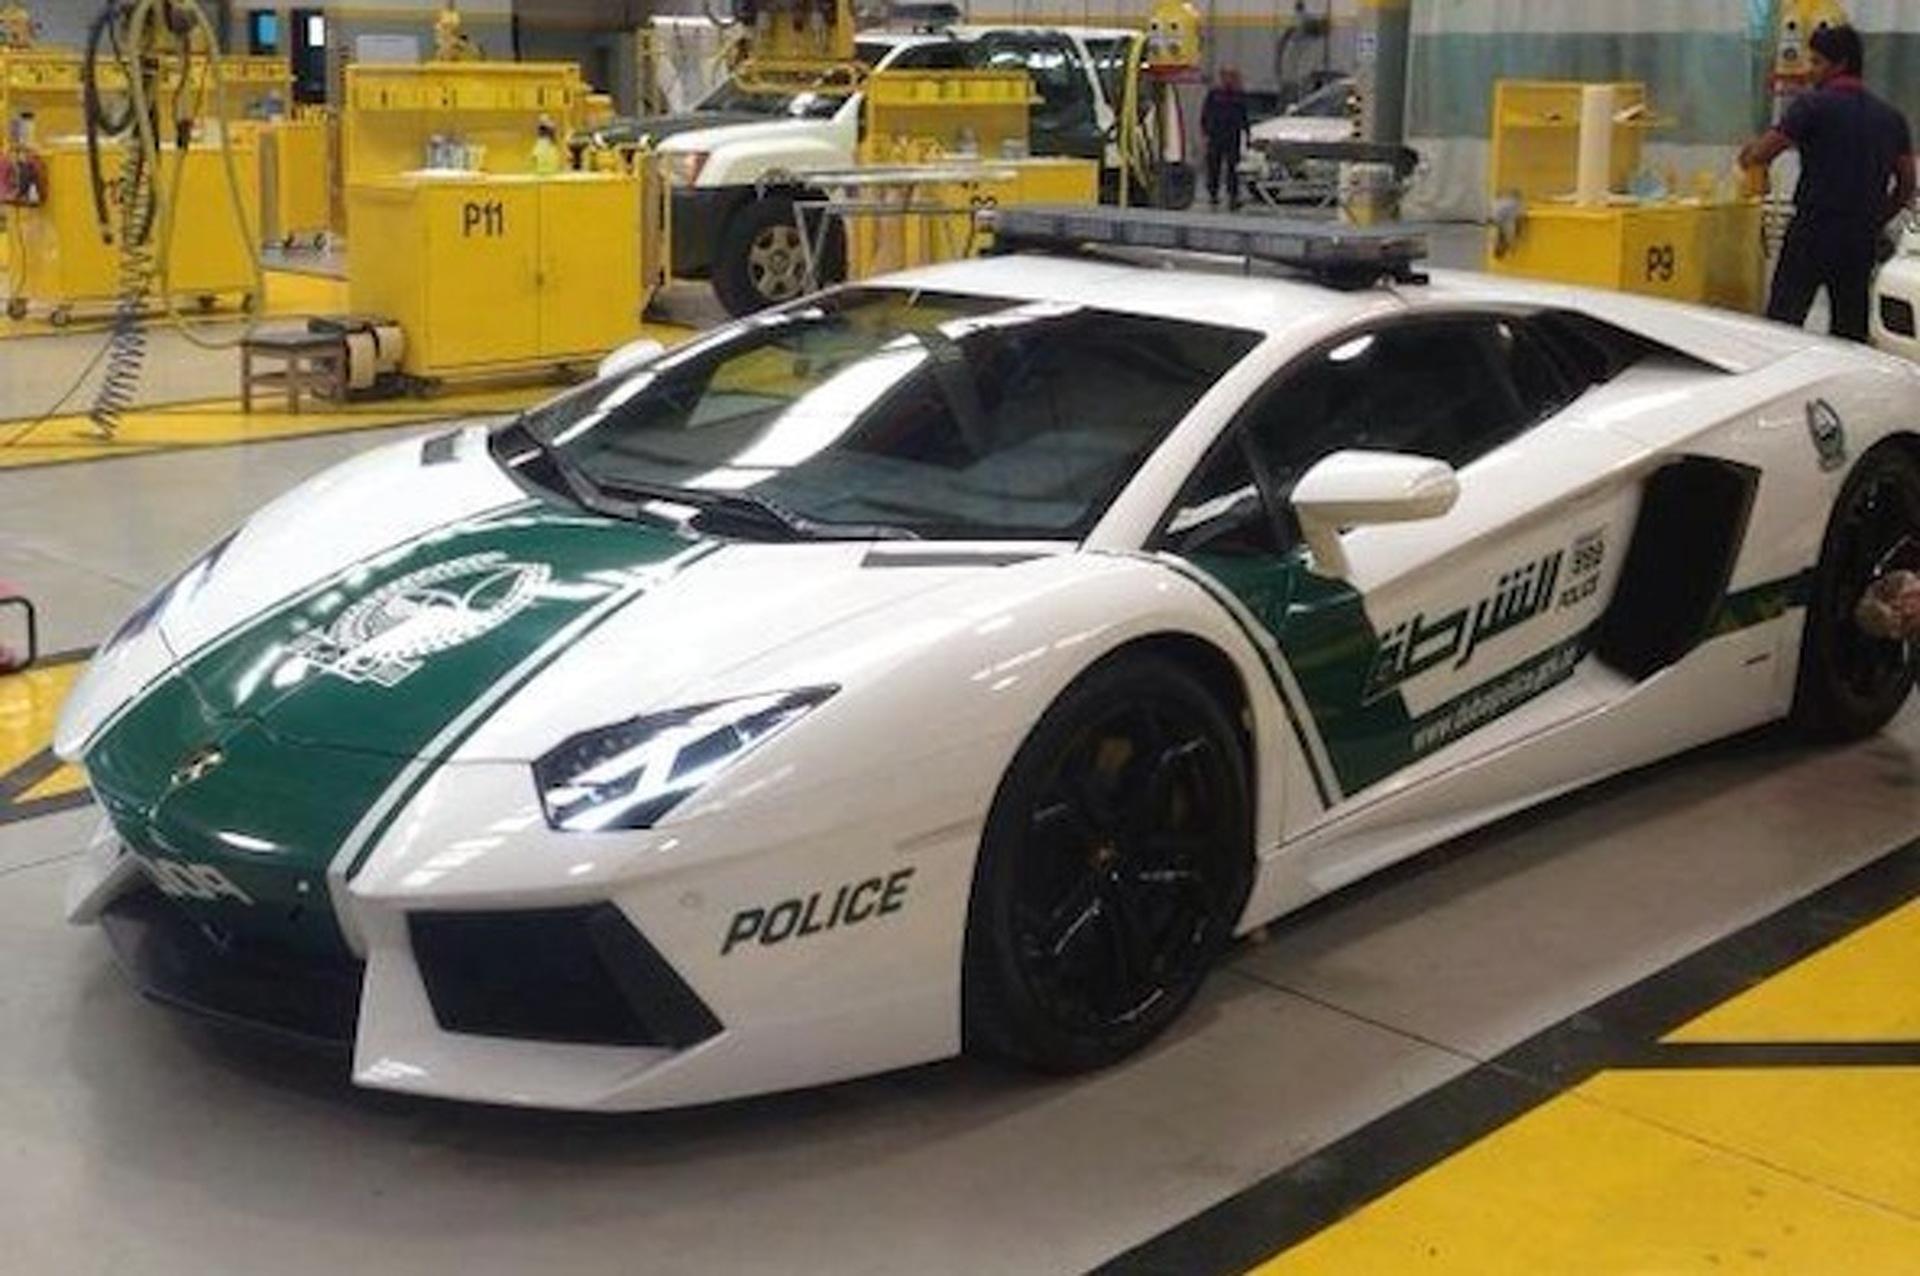 Dubai Police Take Delivery of Lamborghini Aventador Patrol Car